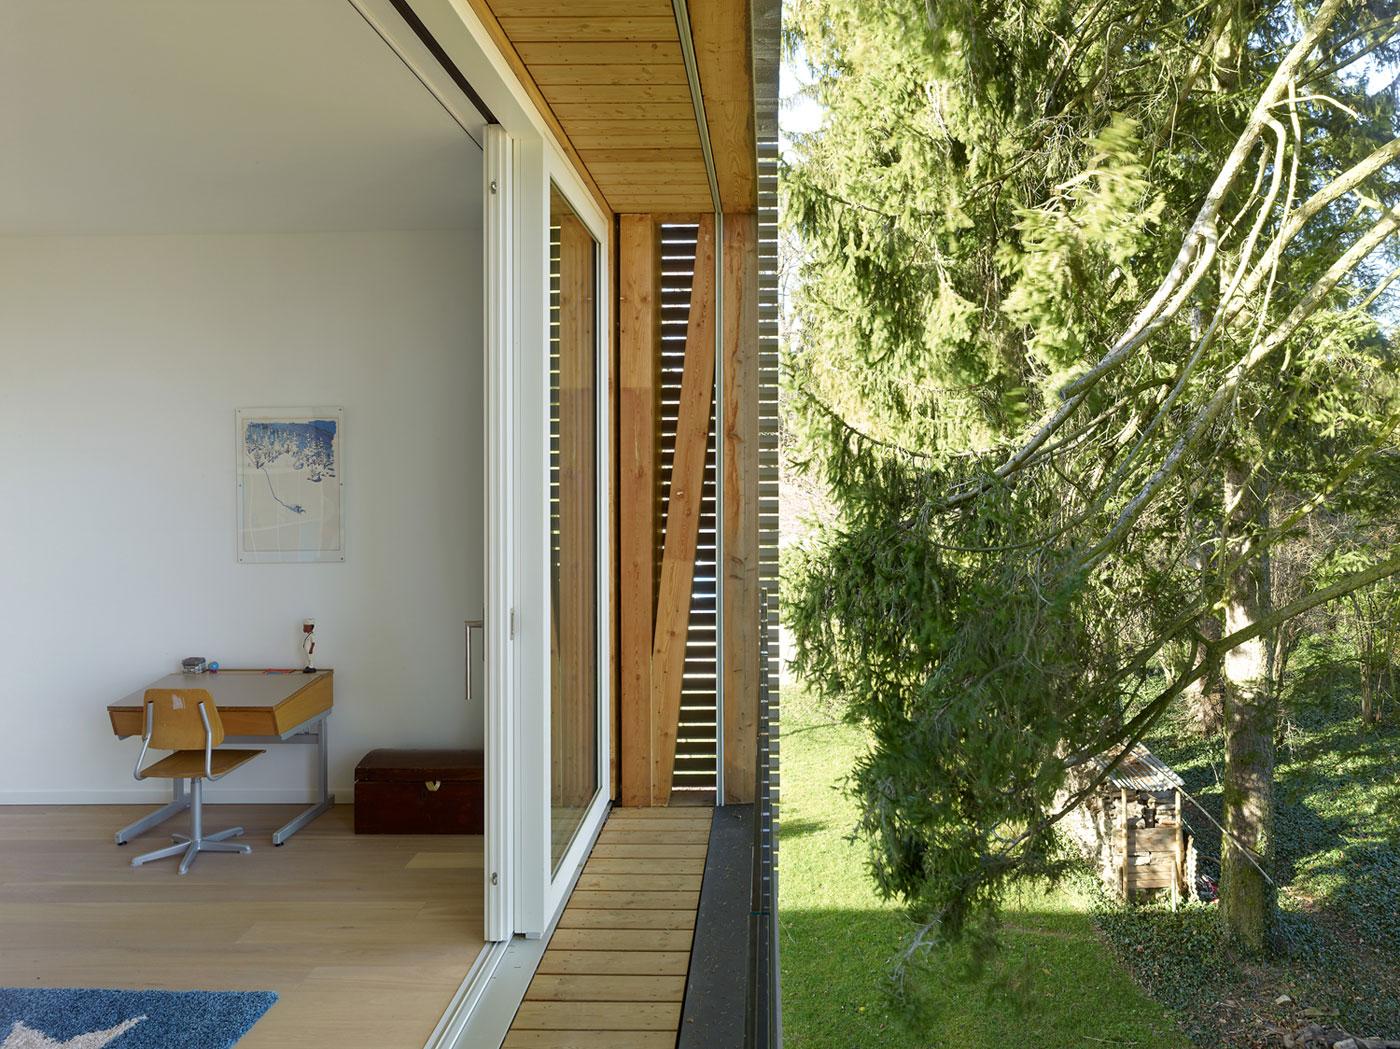 Minergie Villa Christian von Düring architecte-24